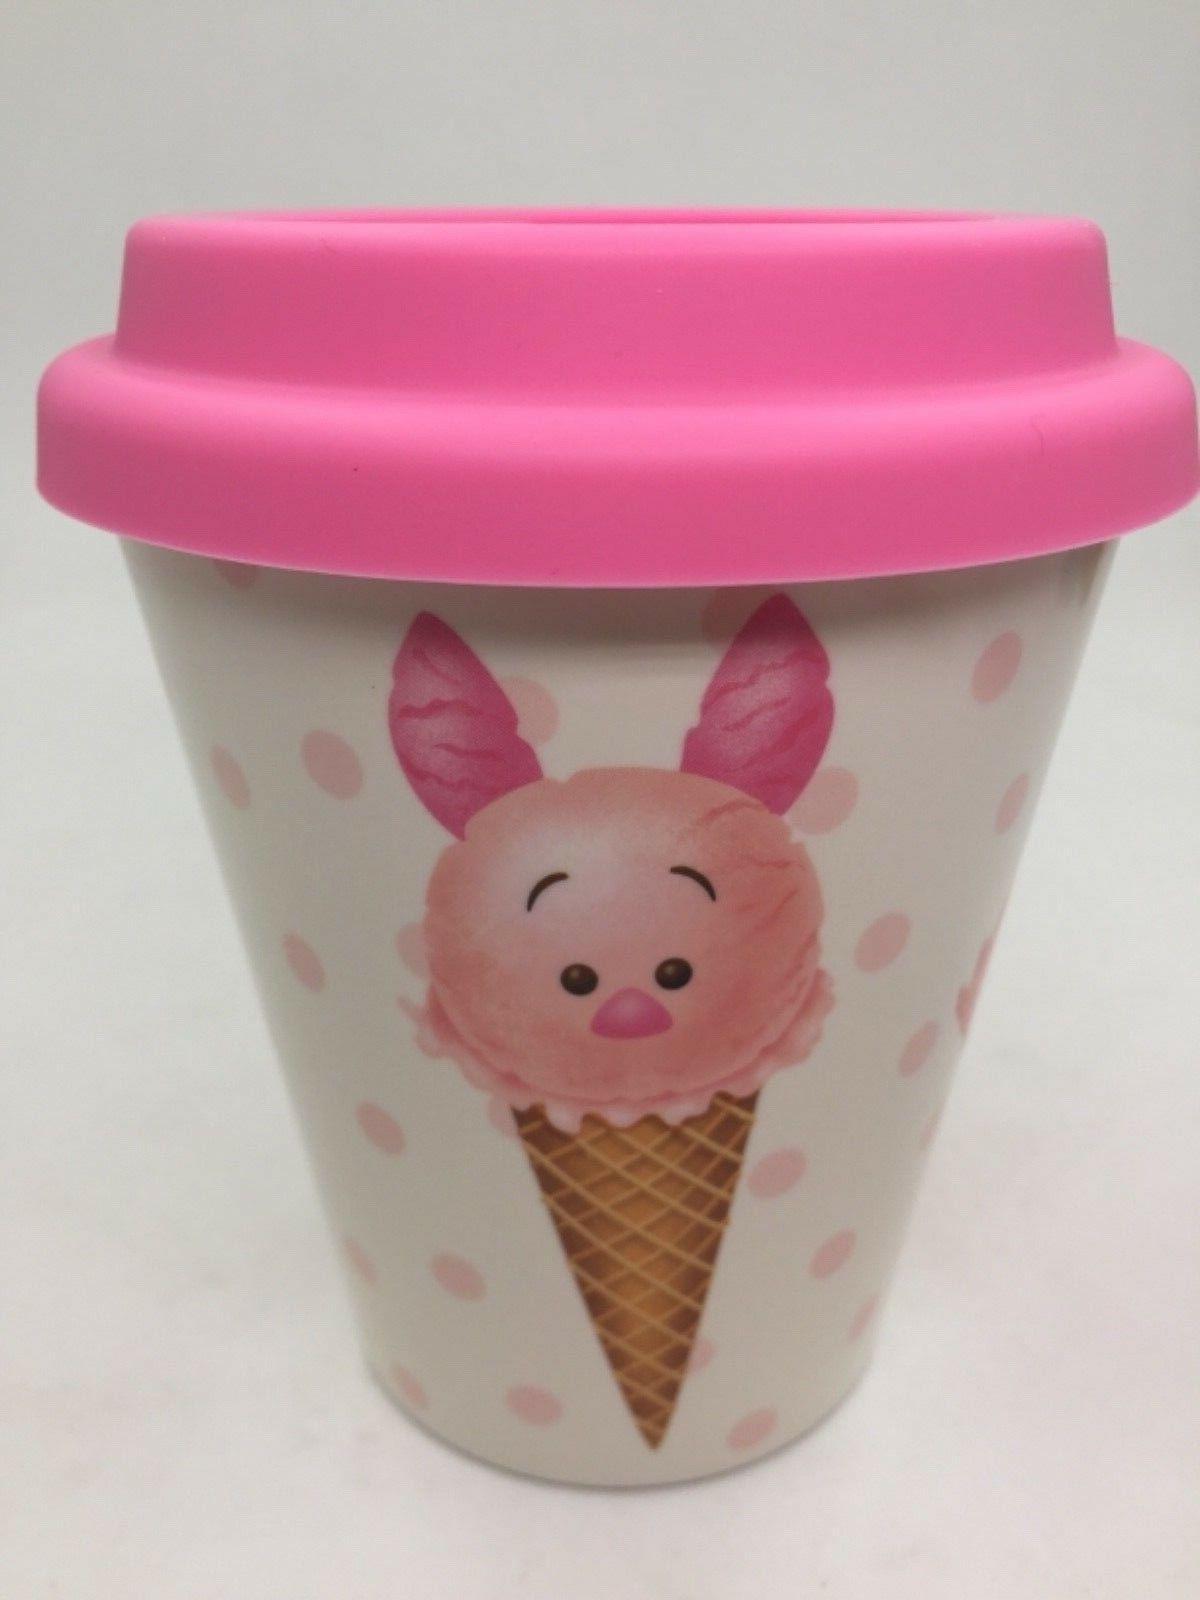 DISNEY Cartoon Water Bottle Mug With Plastic Pink Lid for Ki